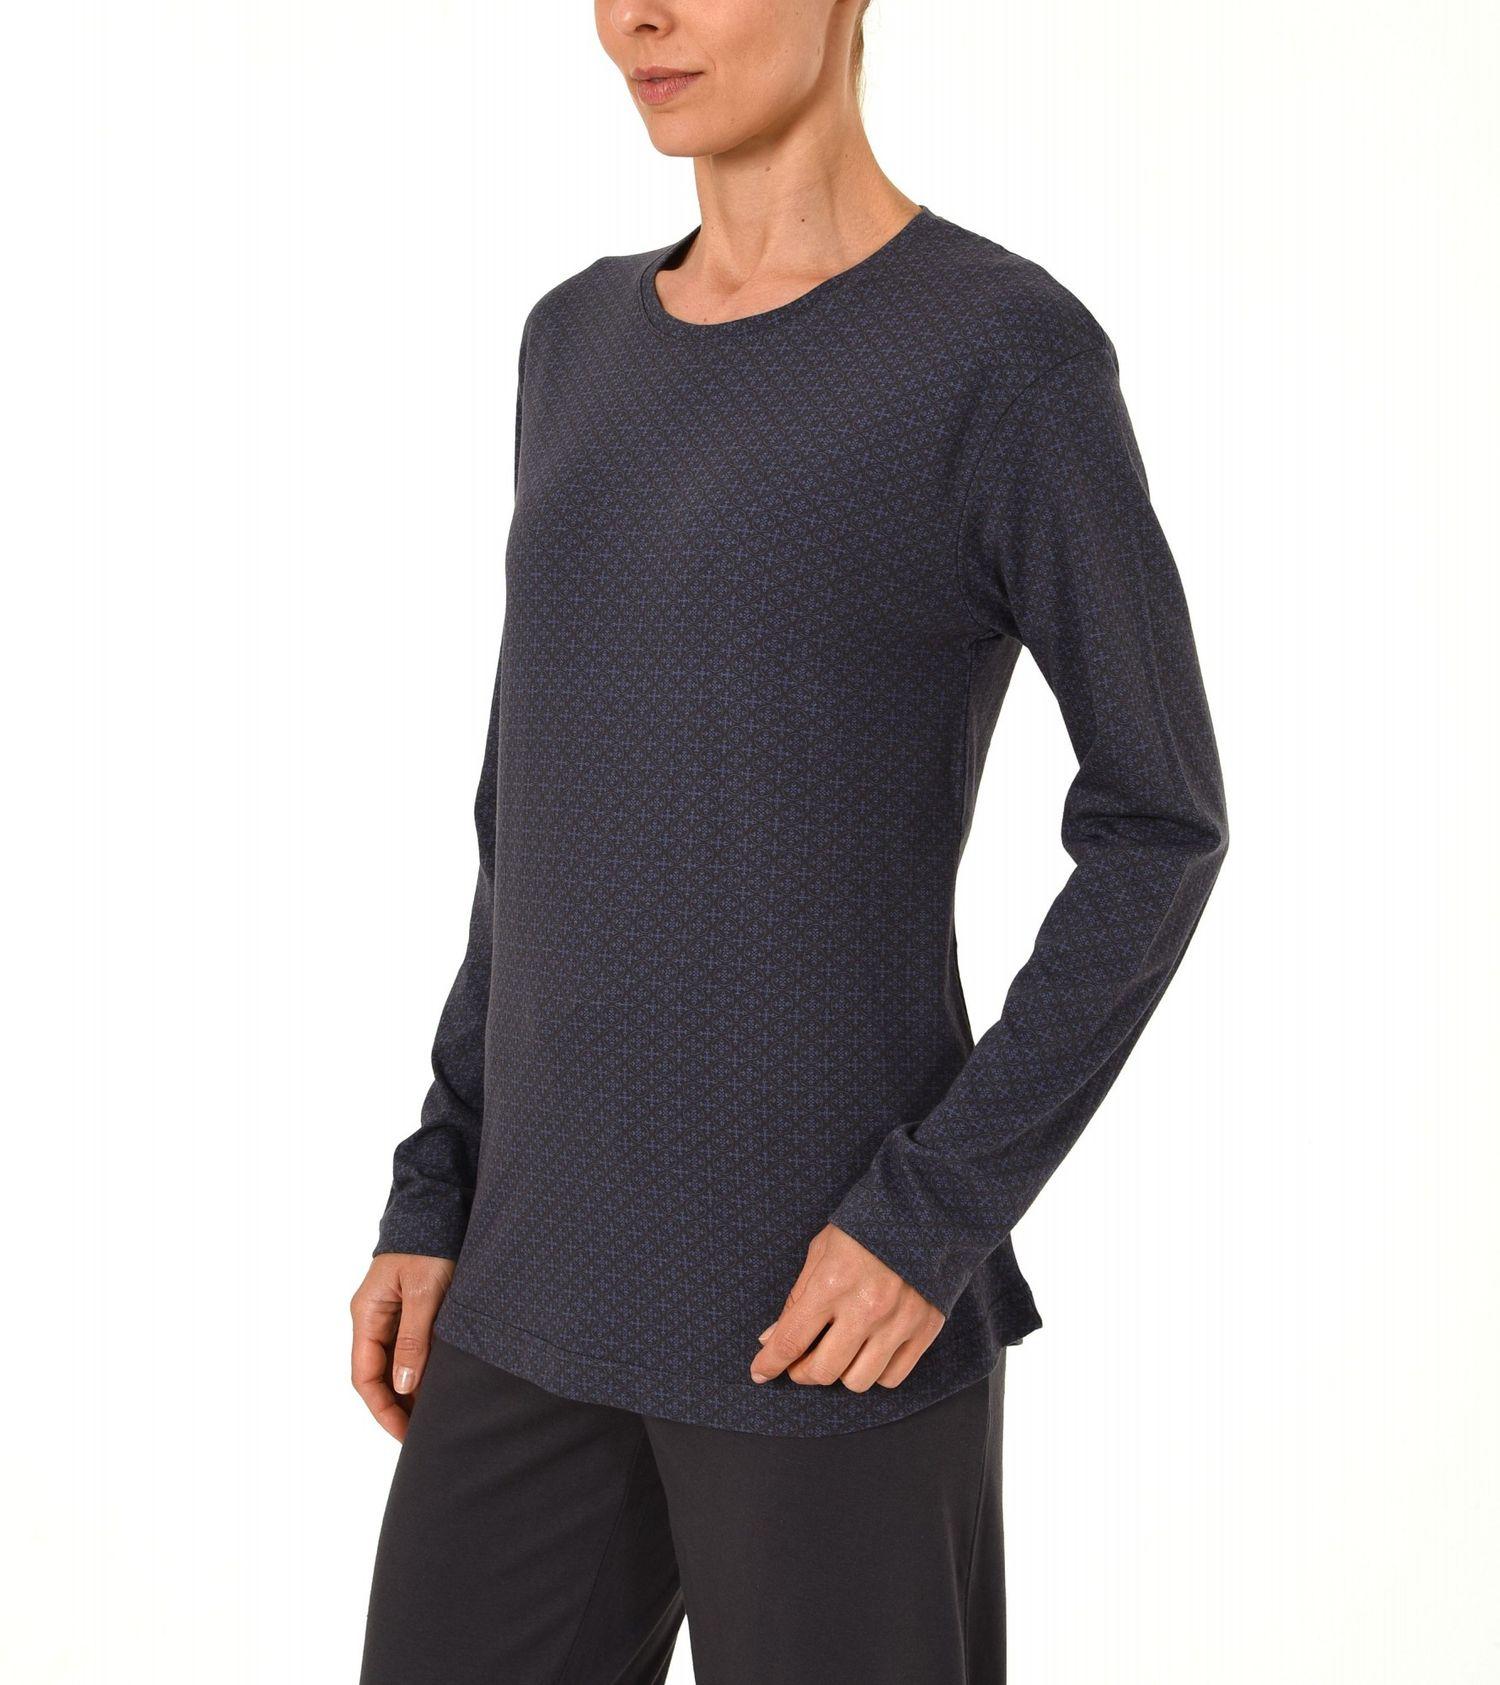 Damen Shirt - Oberteil langarm Mix & Match minimal Print  – 271 219 90 104 – Bild 5